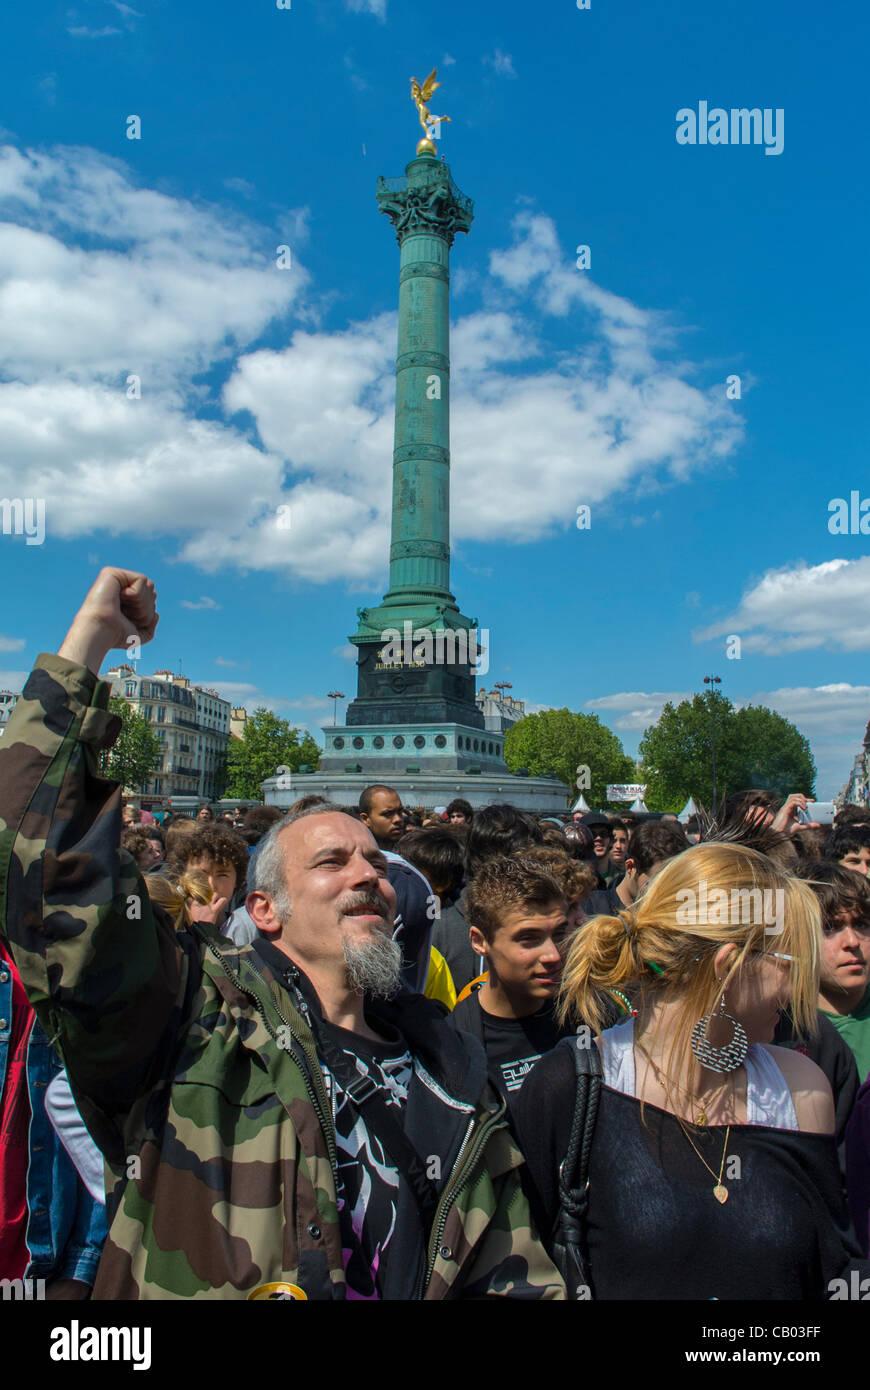 Crowd Scene with Man Raising Fist at 'World Cannabis March for Marijuana Legalization' Place de la Bastille - Stock Image